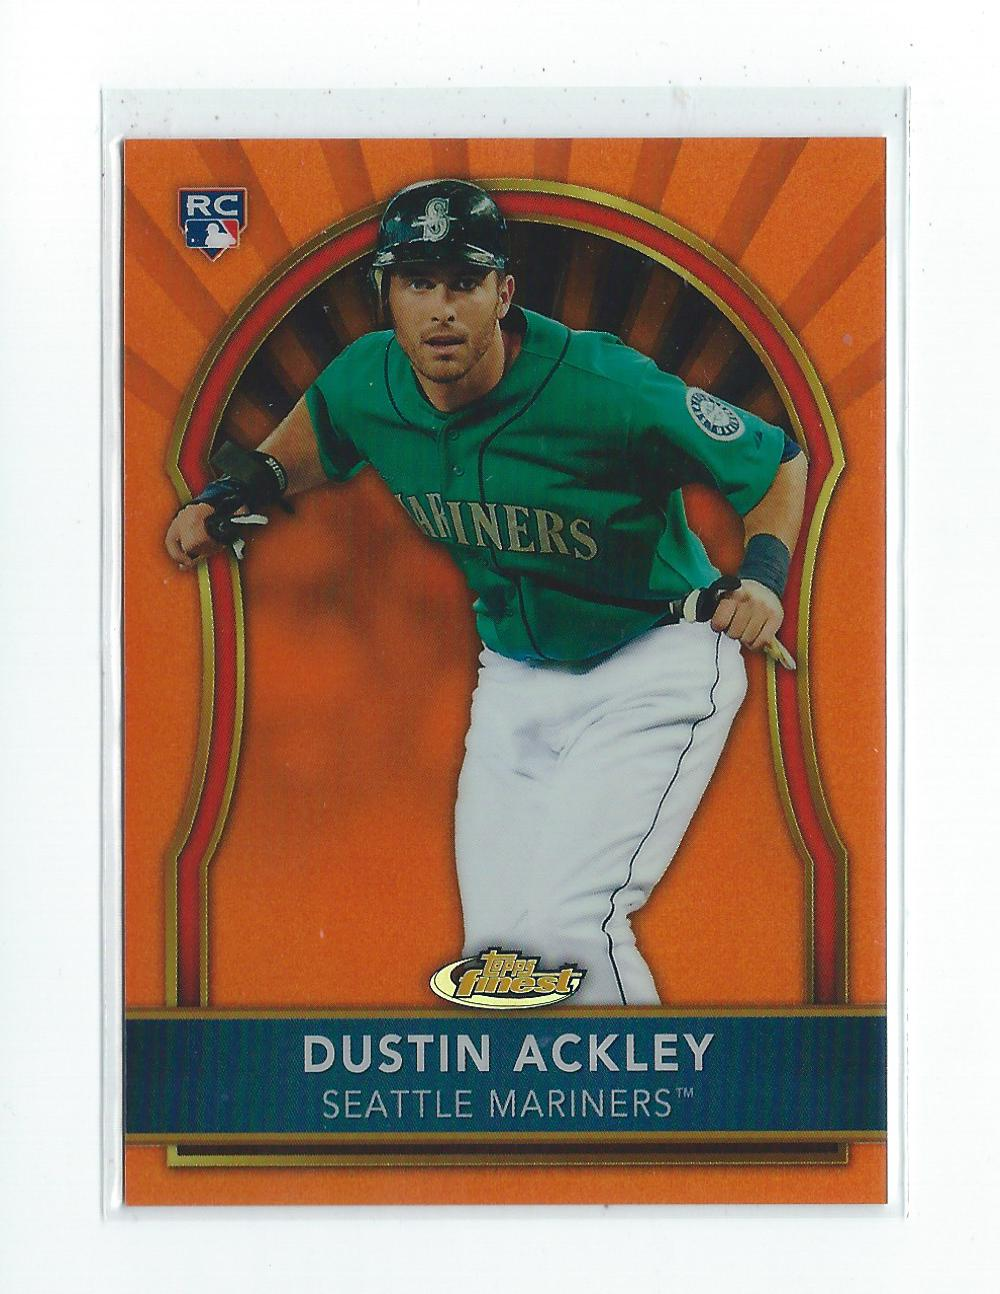 2011 Finest Orange Refractors #76 Dustin Ackley